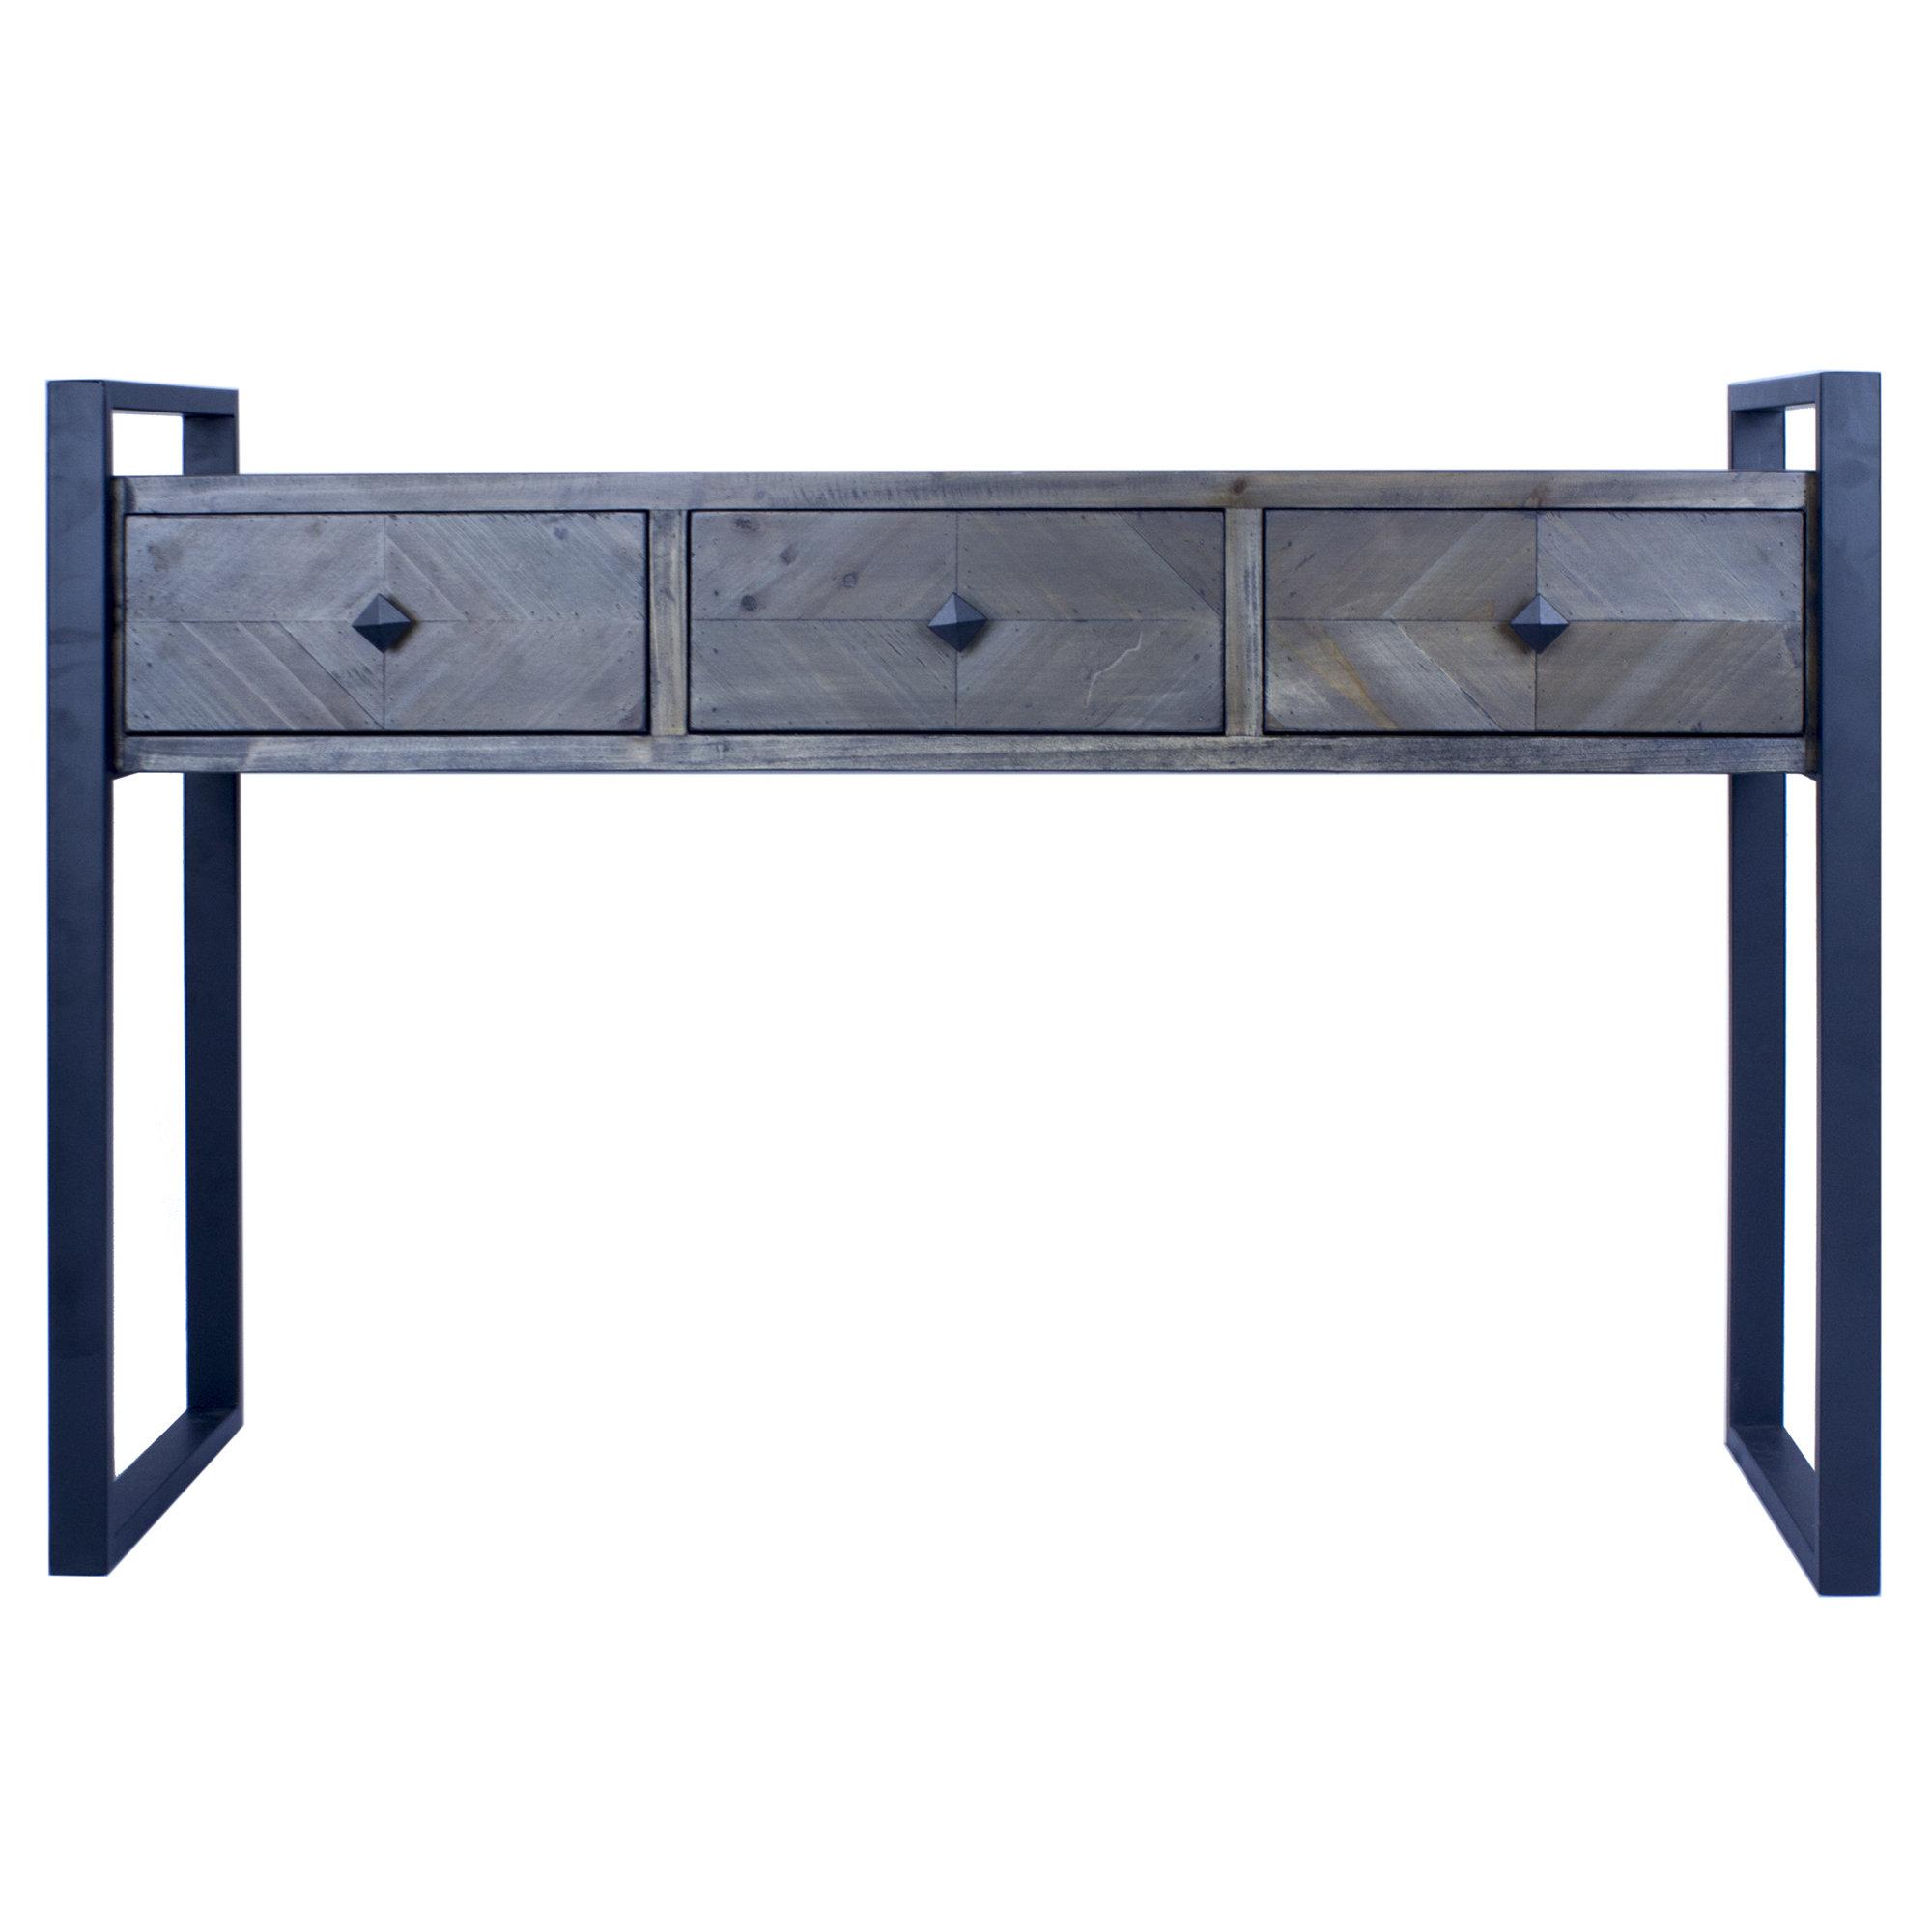 Phenomenal Delphine 3 Drawer Console Table Interior Design Ideas Oxytryabchikinfo